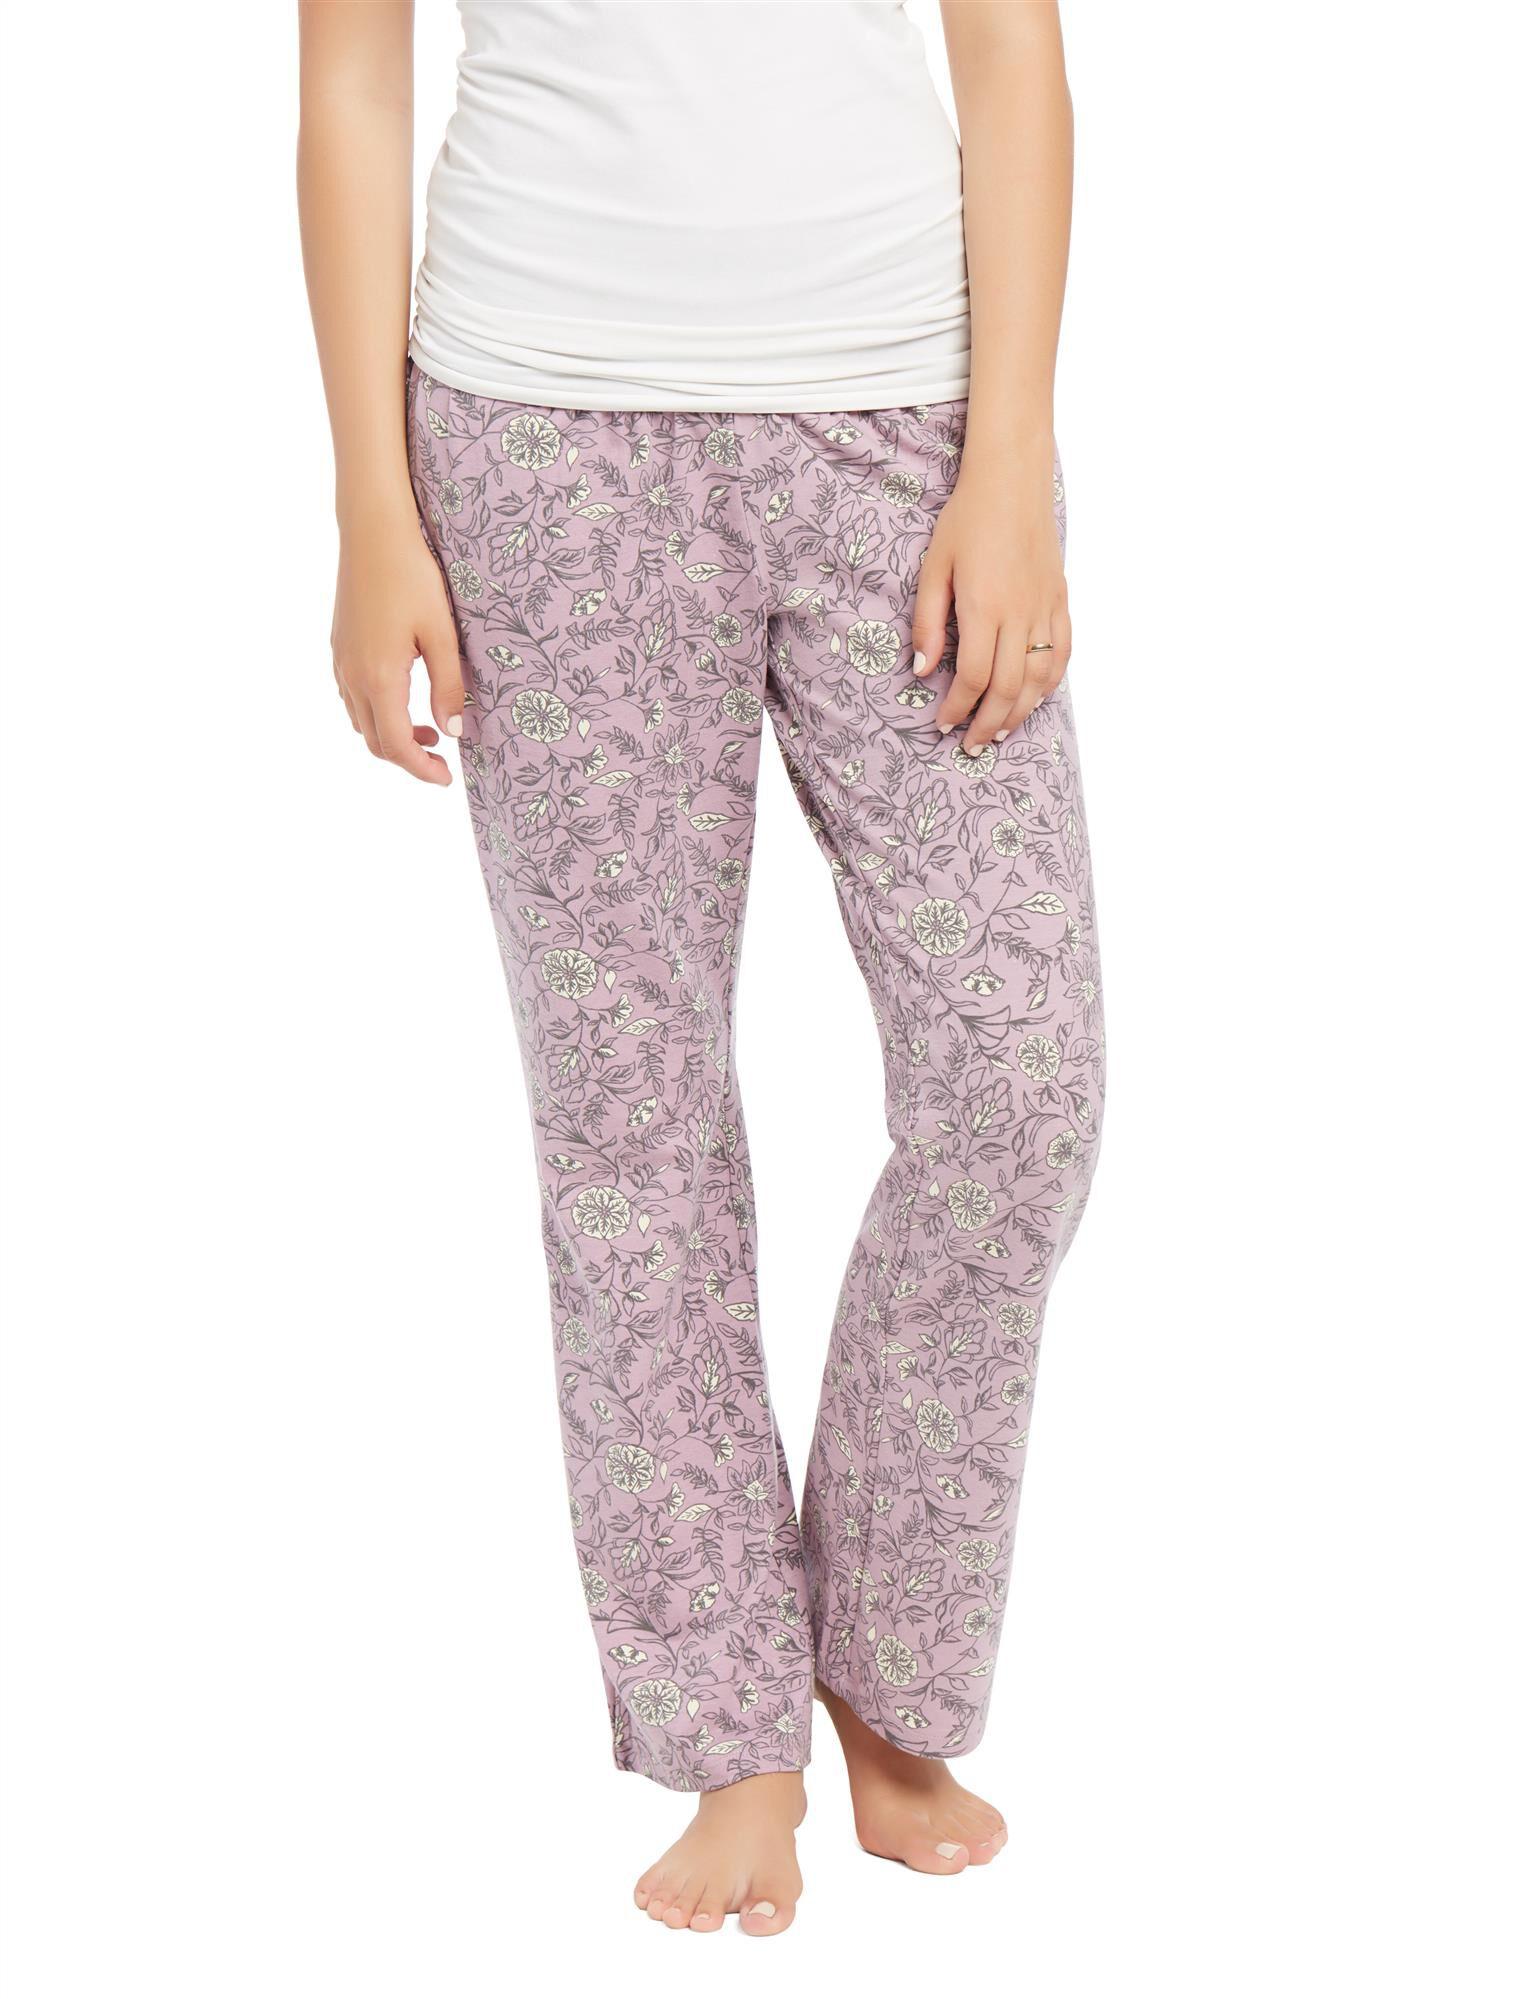 Maternity Sleep Pants- Prints